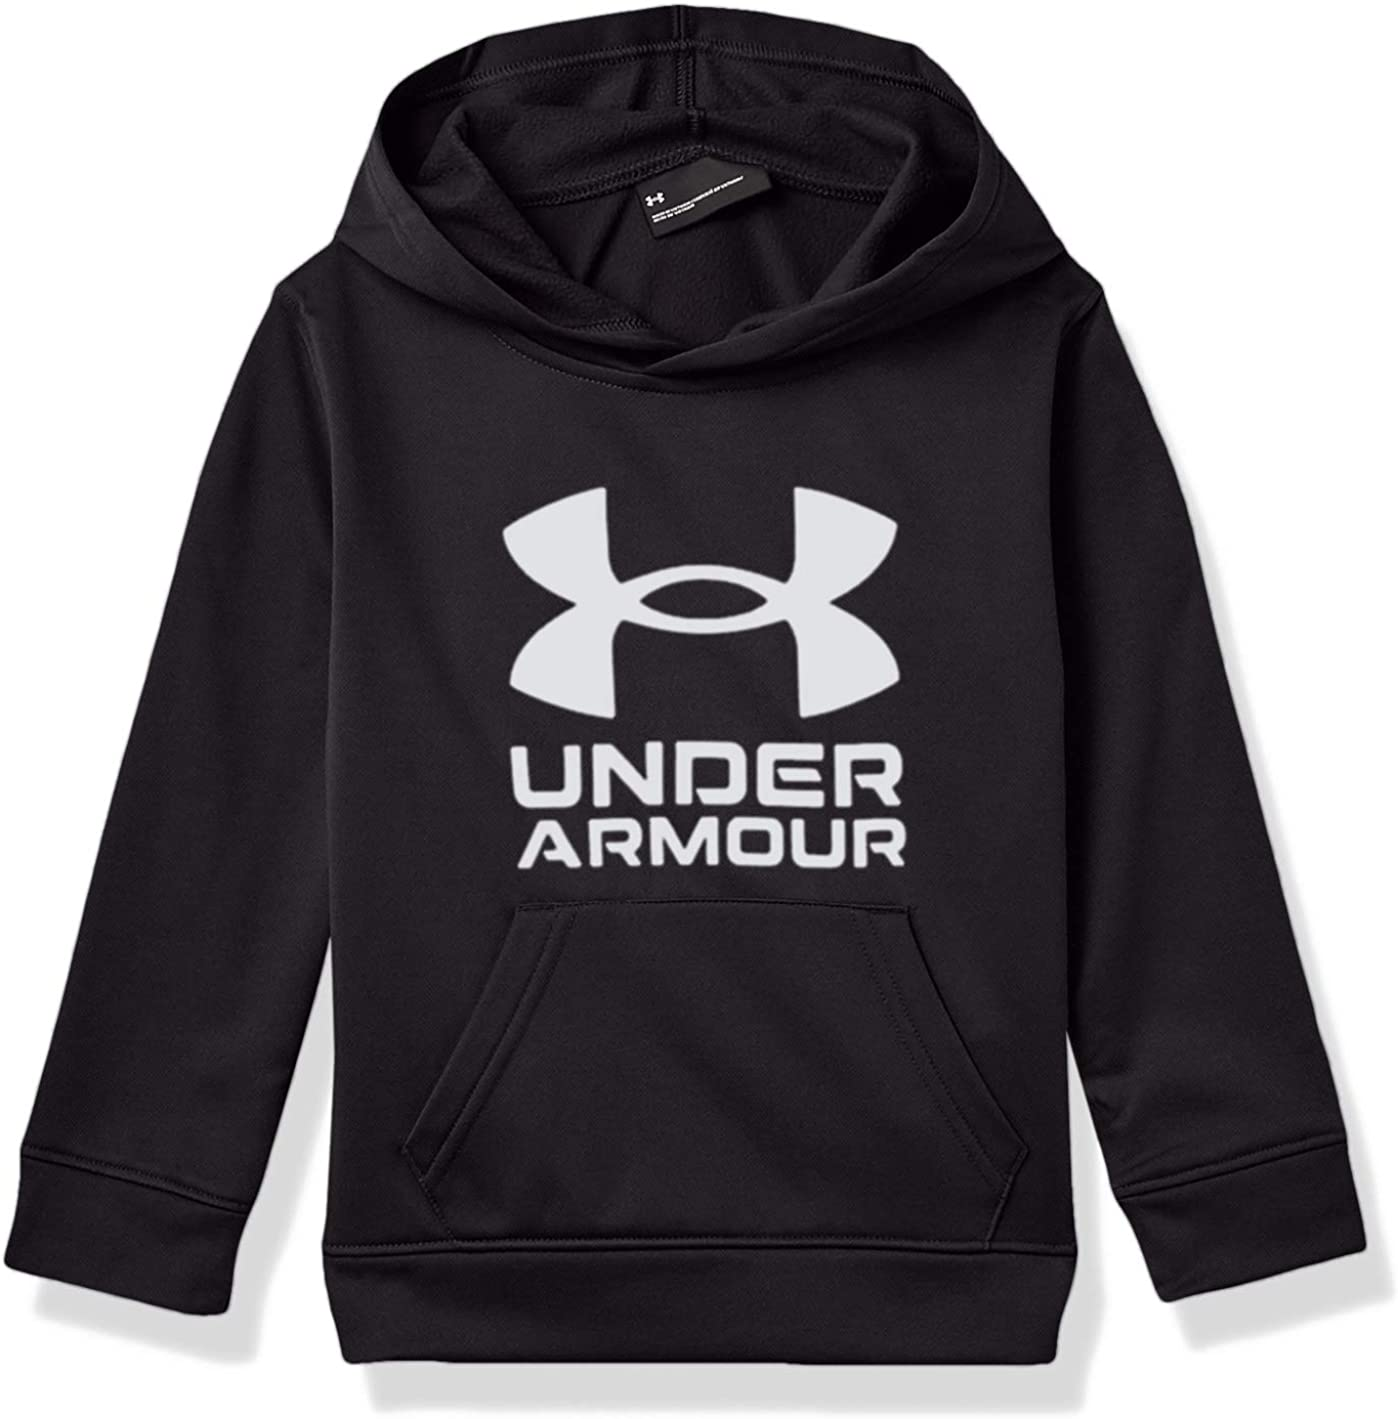 Under Armour Boys' Ua Symbol Hoodie